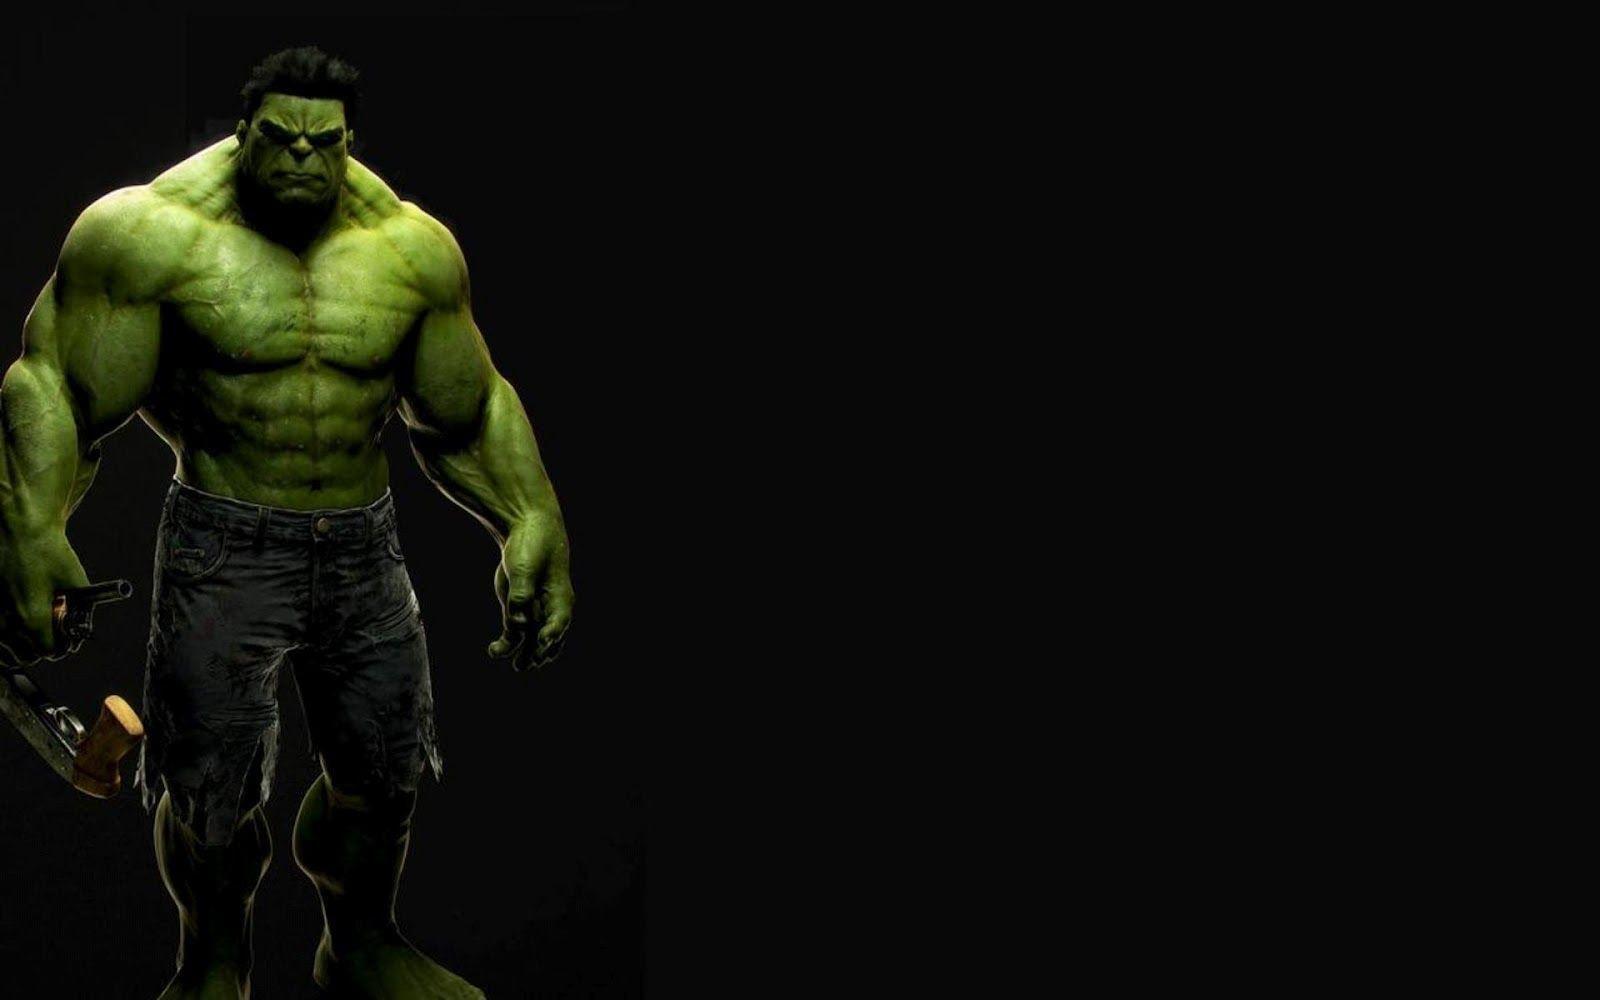 The Incredible Hulk Wallpapers - Wallpaper Cave